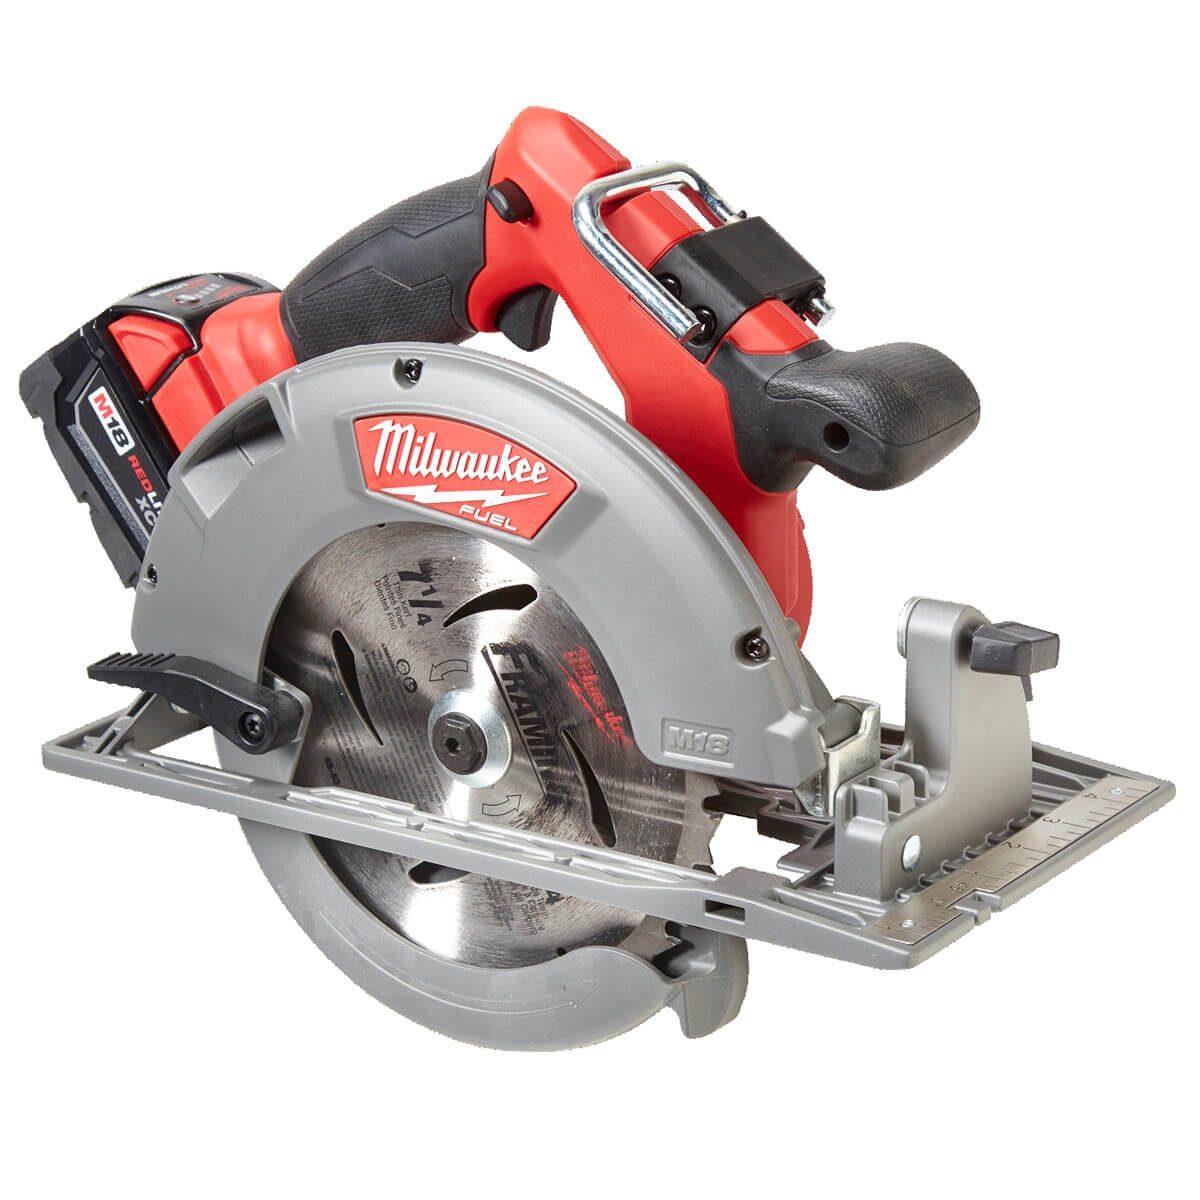 FH18DJF_583_52_039 cordless circular saws